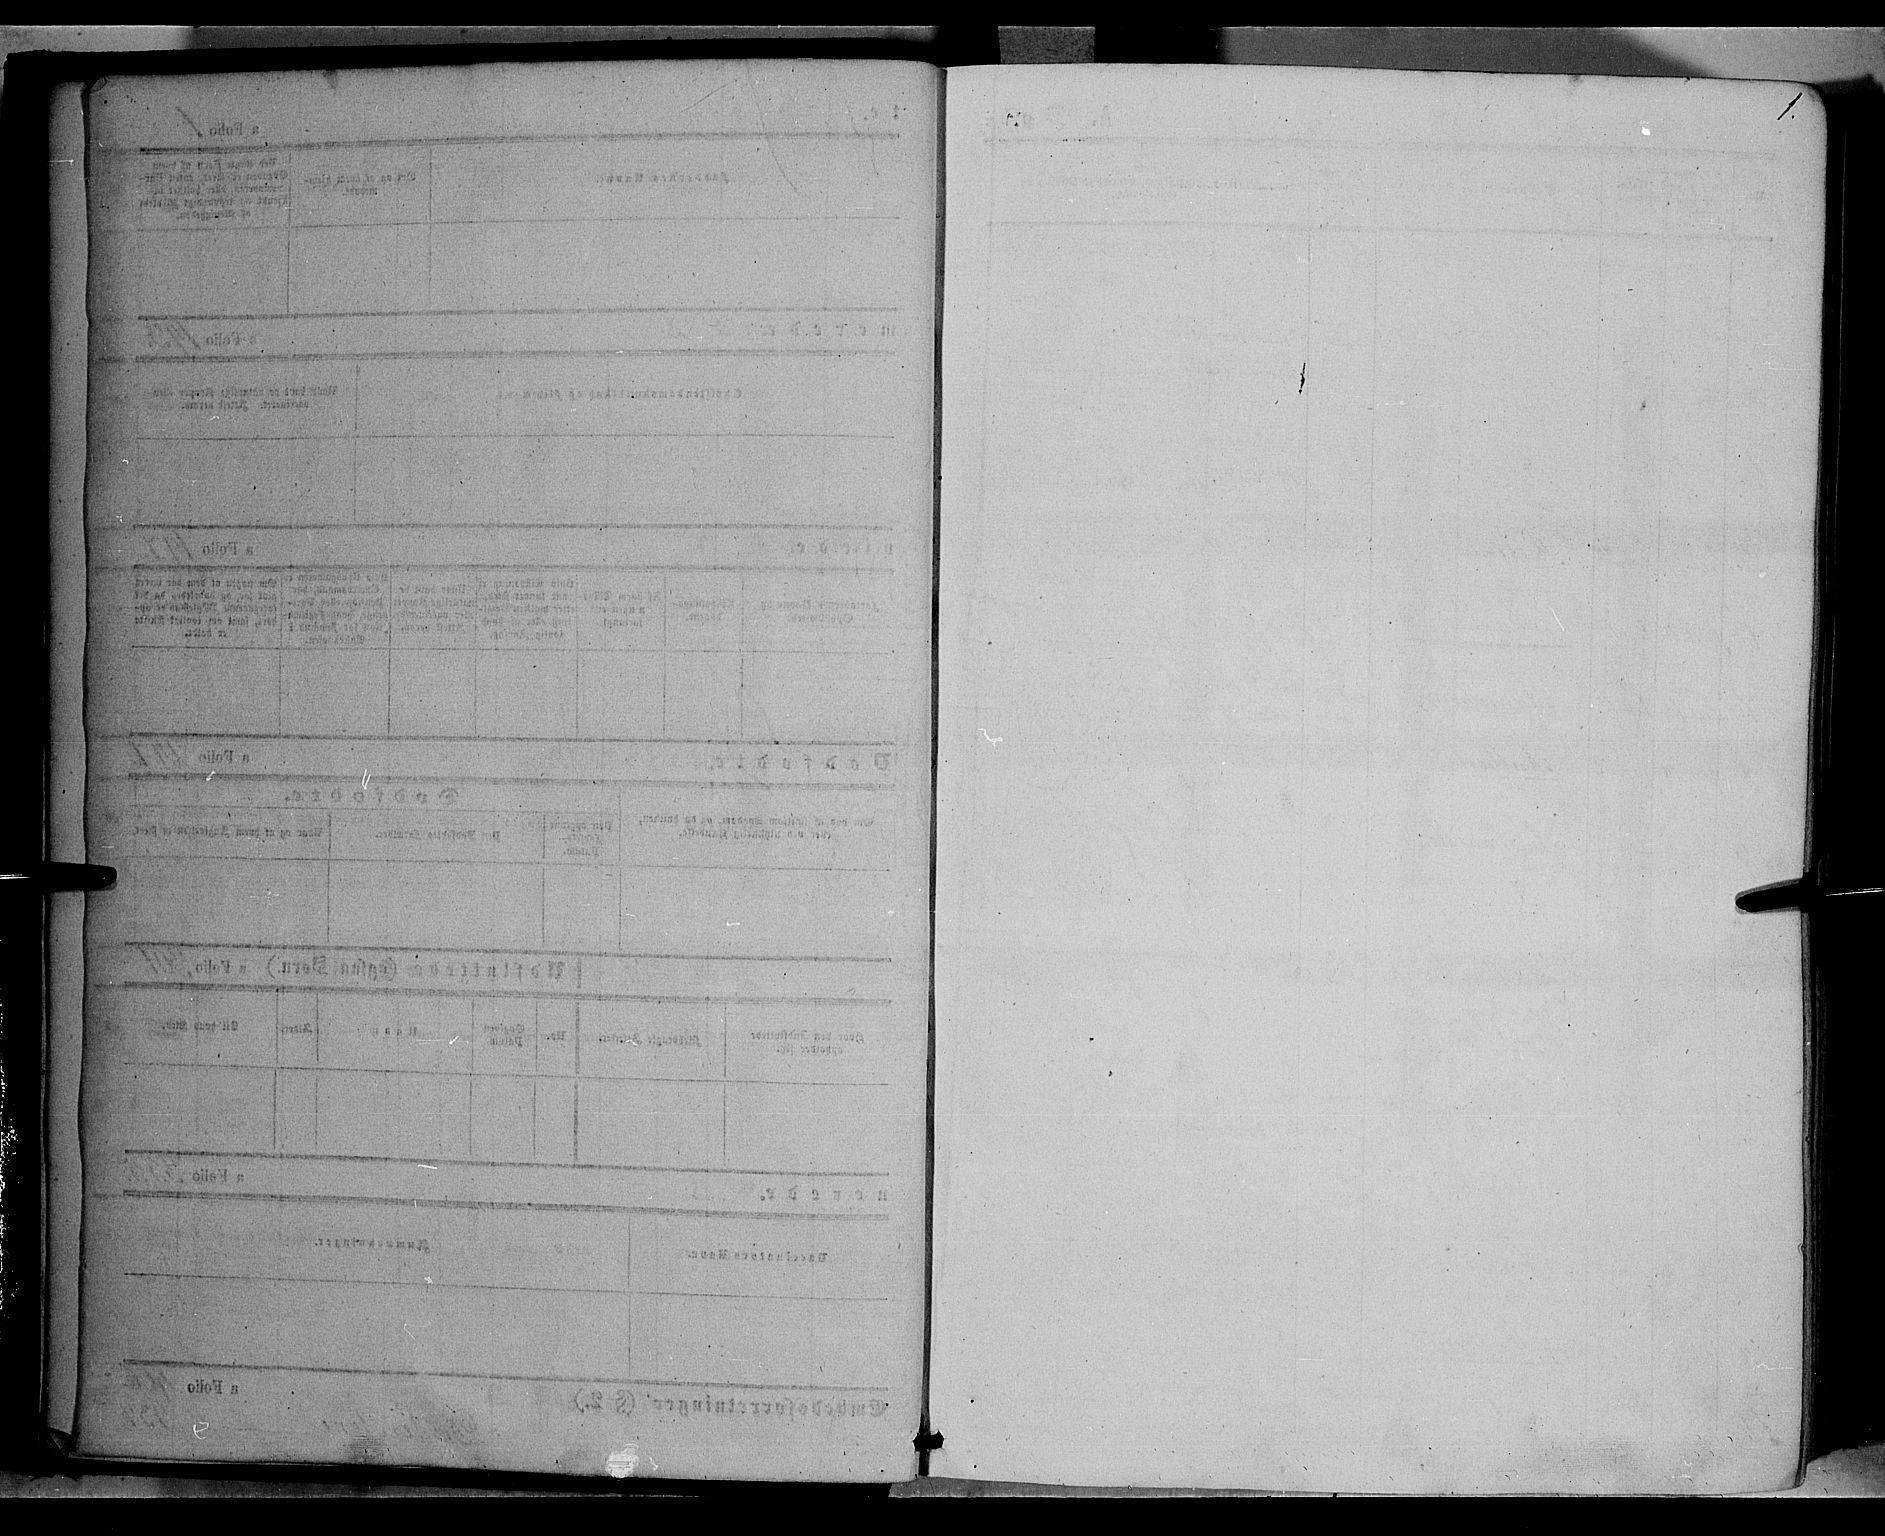 SAH, Vardal prestekontor, H/Ha/Haa/L0006: Ministerialbok nr. 6, 1854-1866, s. 1